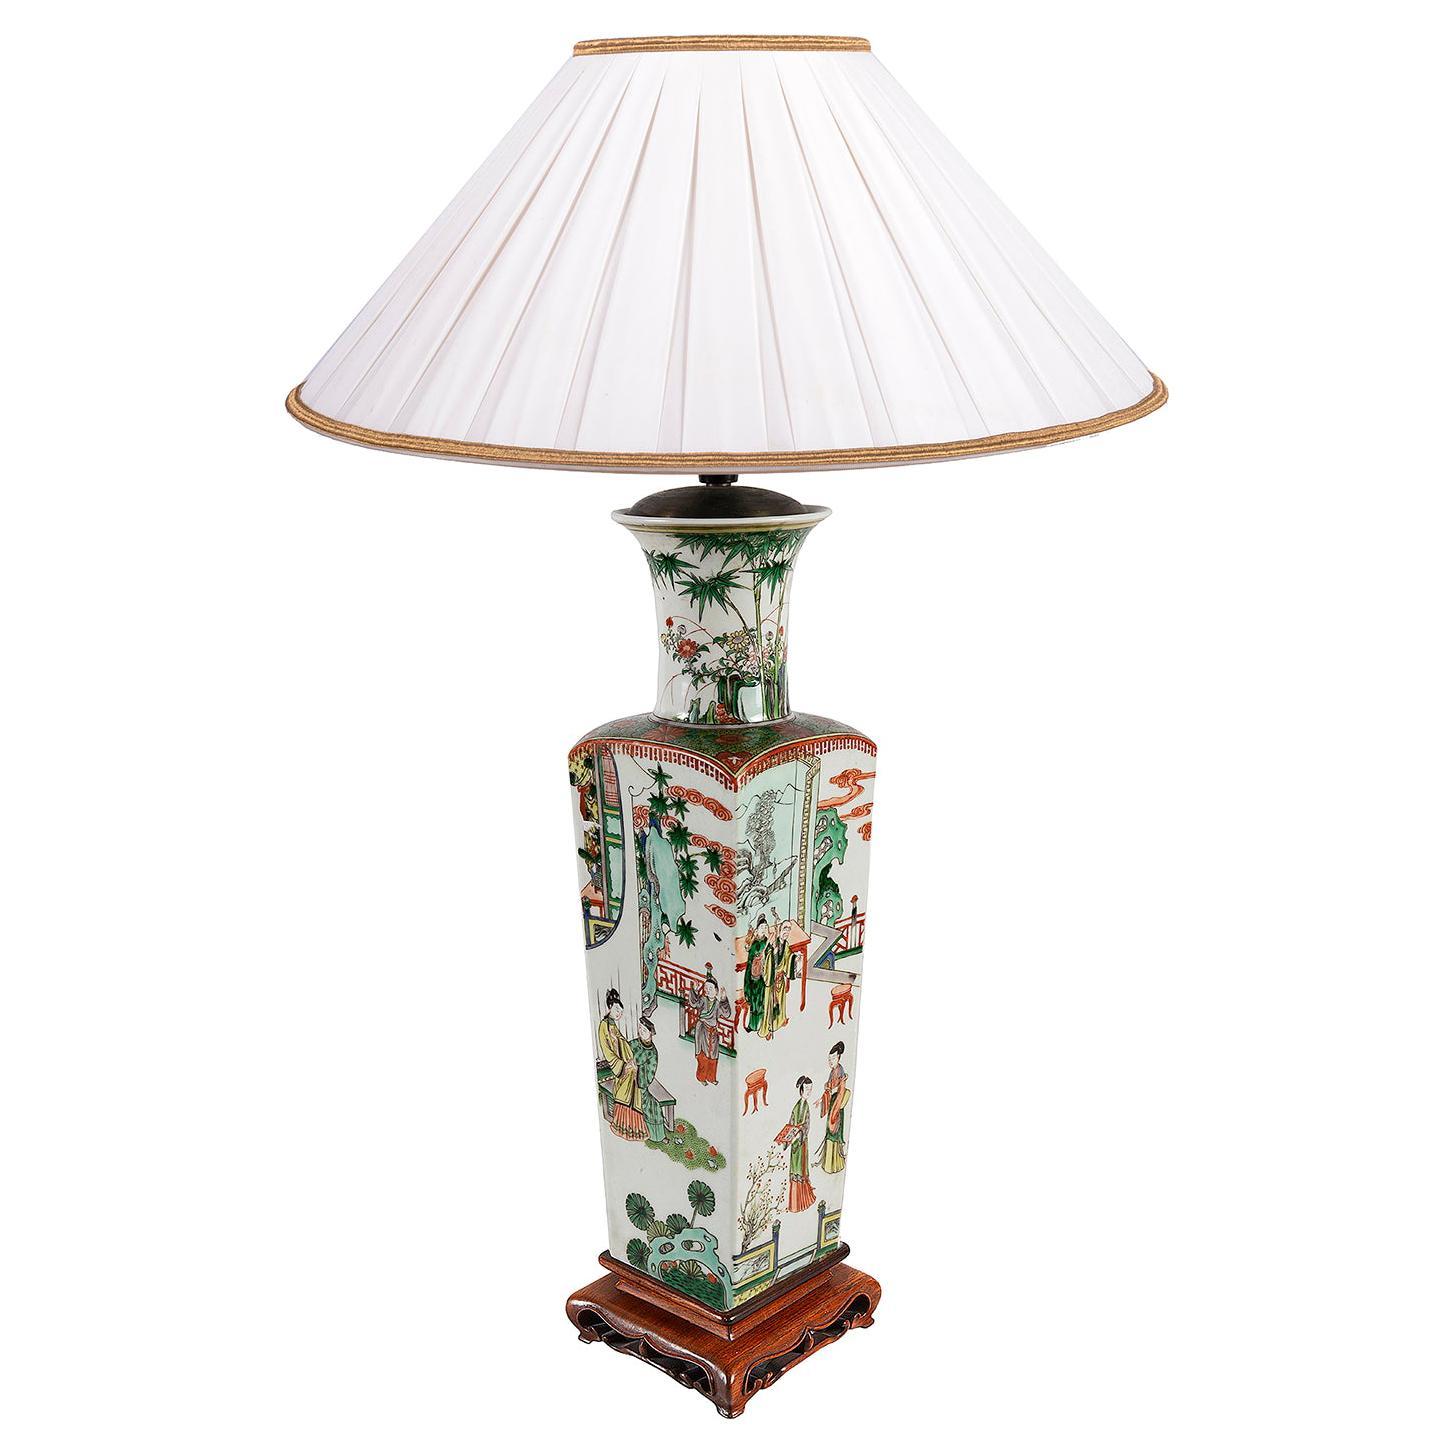 19th Century Chinese Famille Verte Vase / Lamp